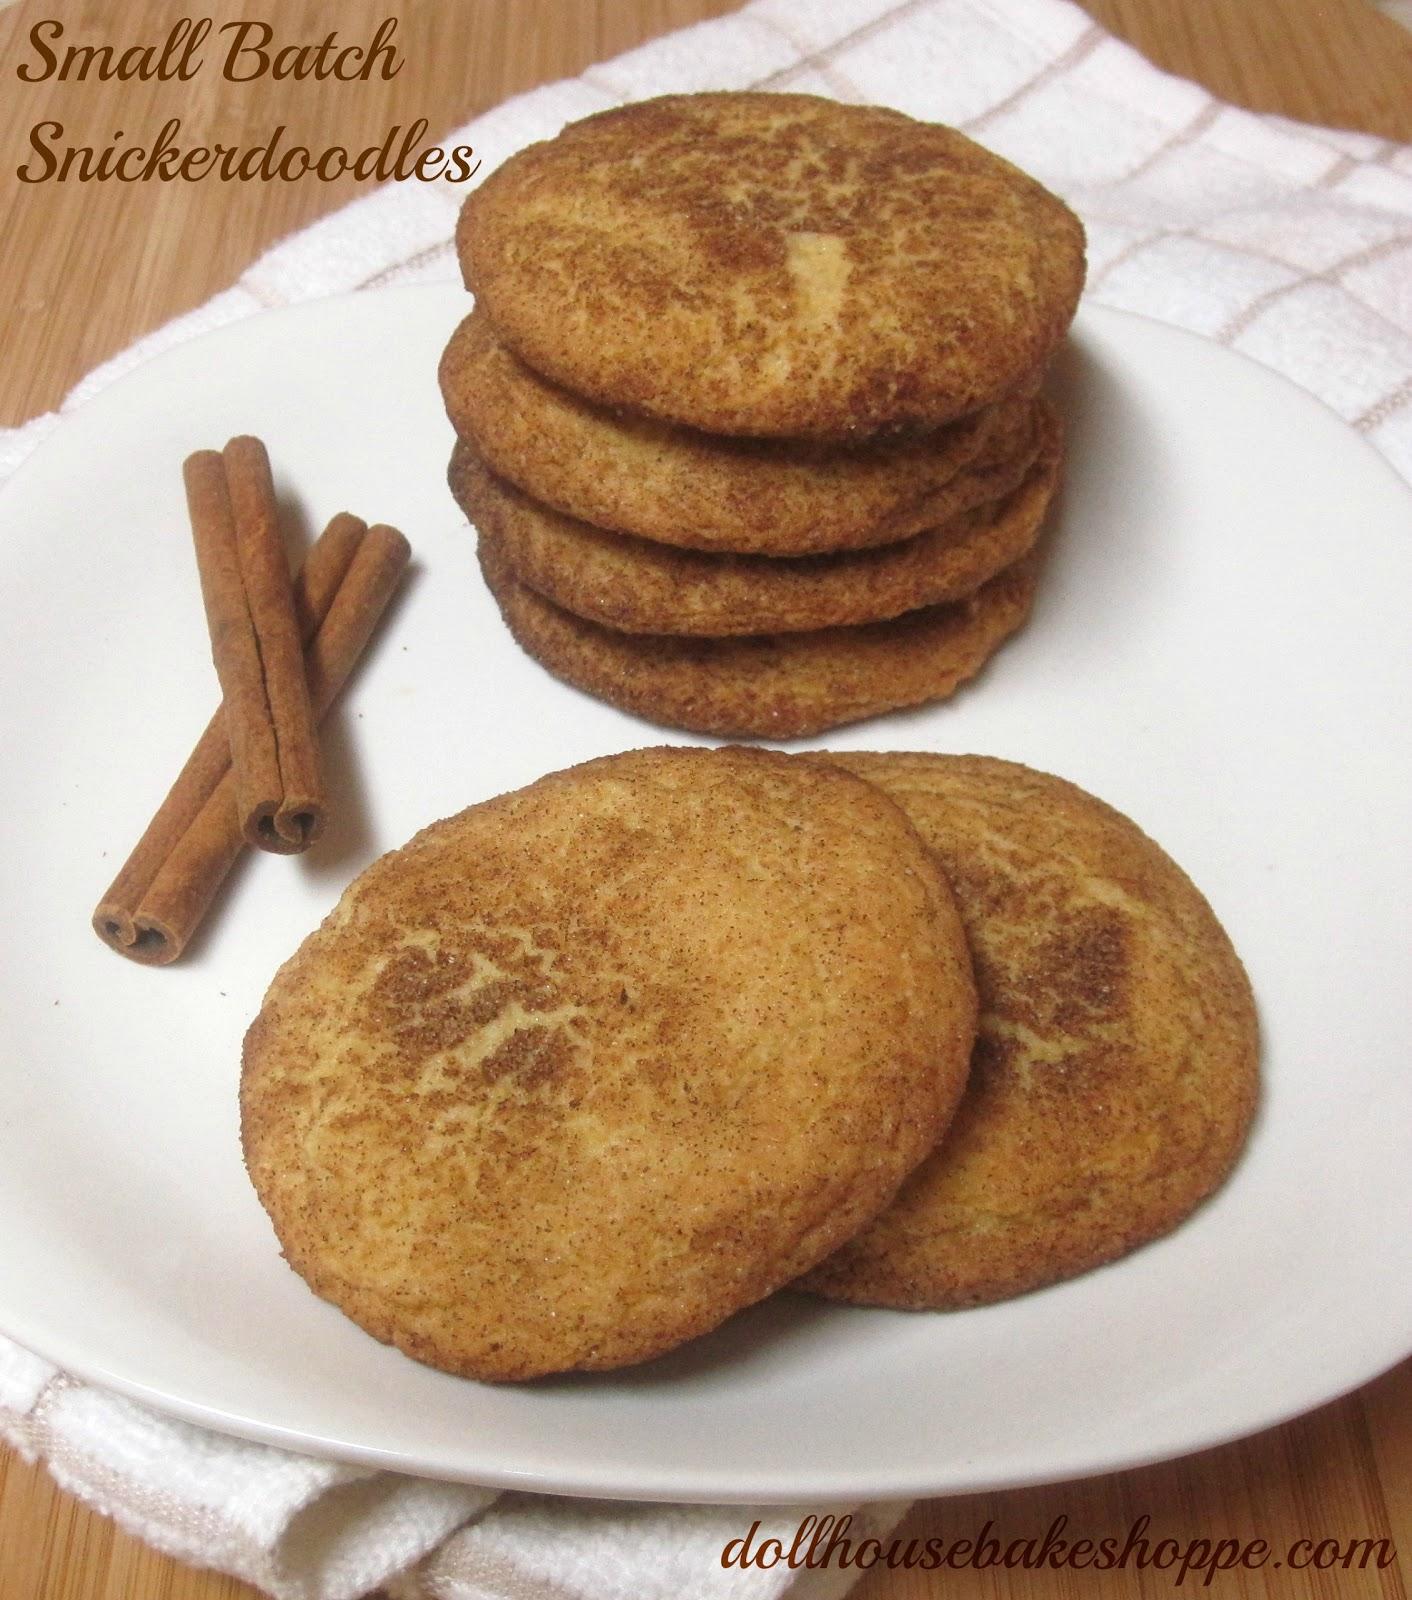 Small Batch Snickerdoodles Recipe